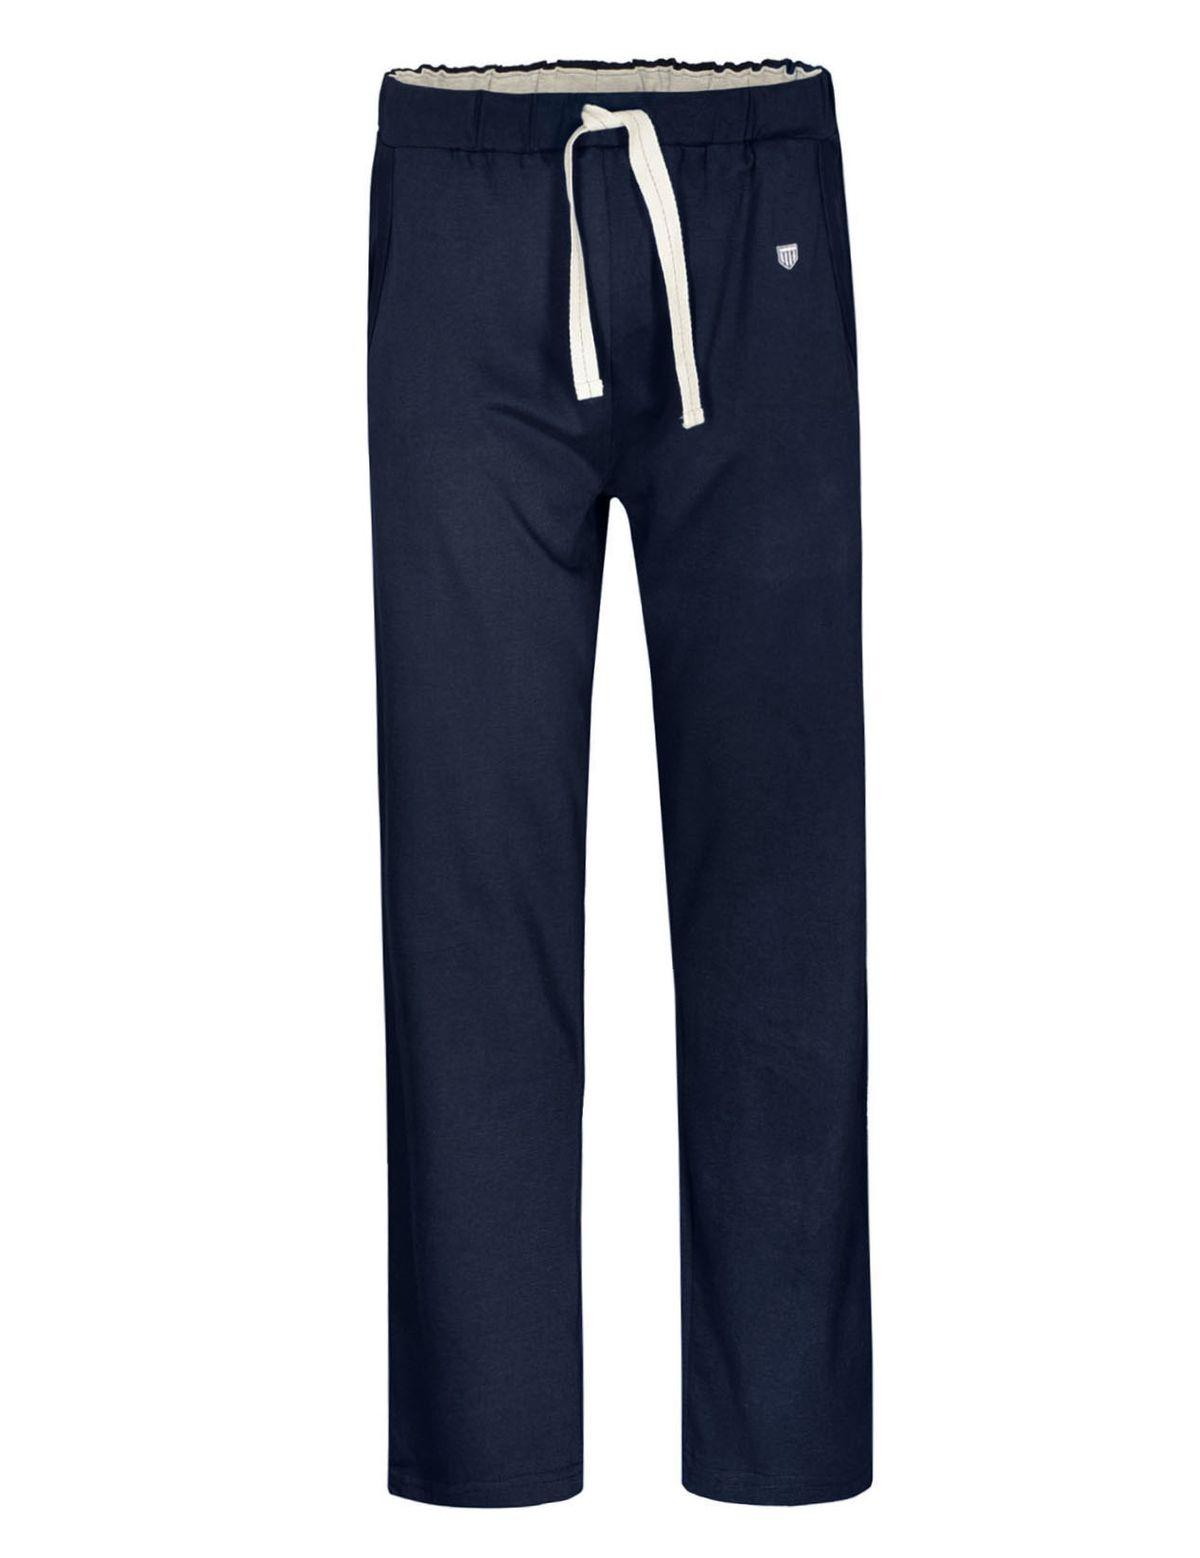 HOMEWEAR Pyjama Hose mit Tunnelzug - Navy